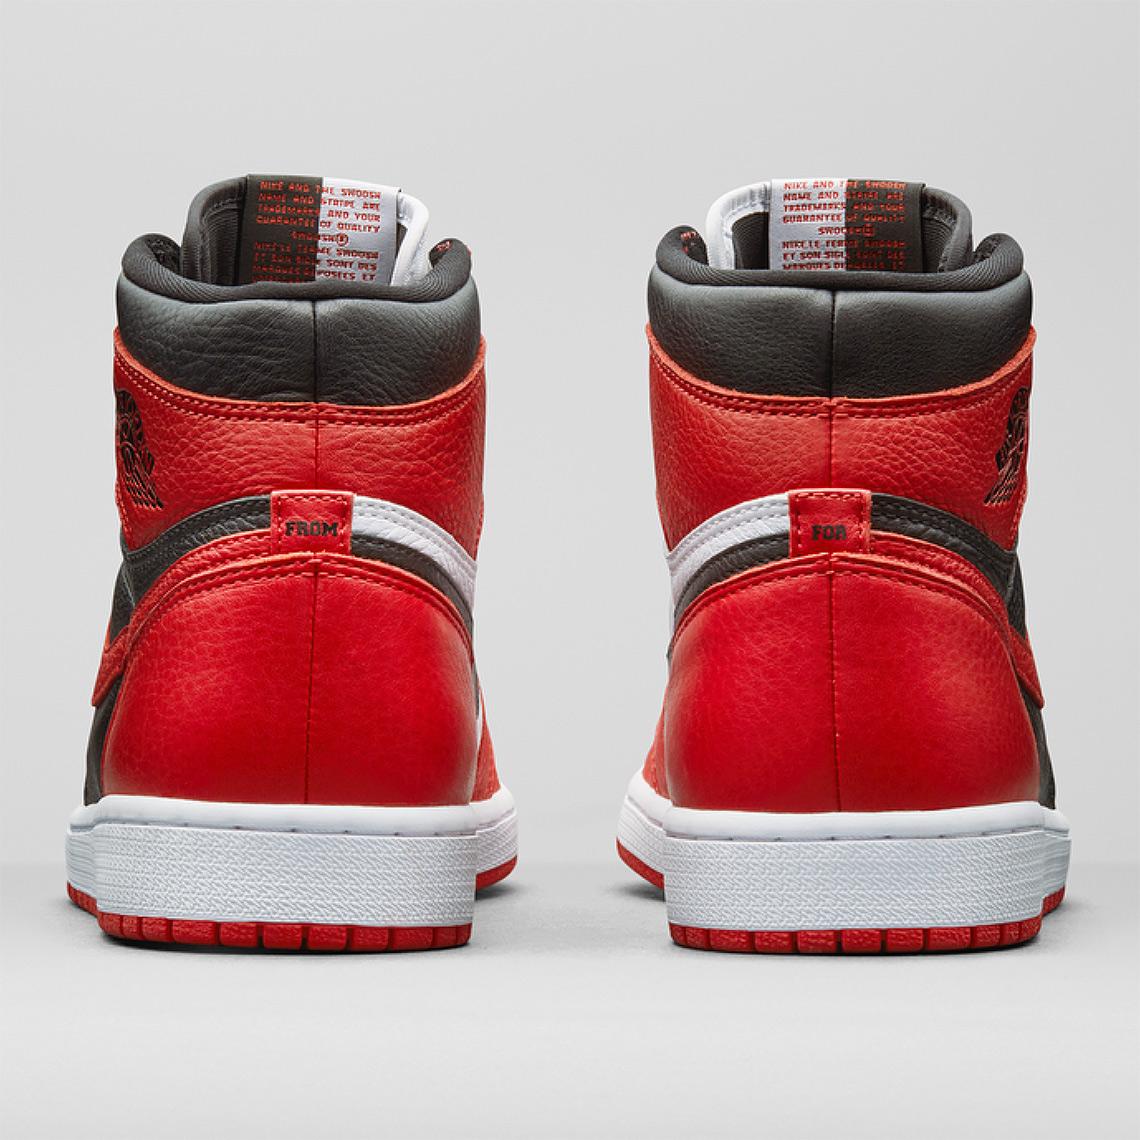 Air Jordan 1 Retro High OG NRG CHI Release Date  April 21st, 2018  160.  Color  Black White-University Red d953790d801